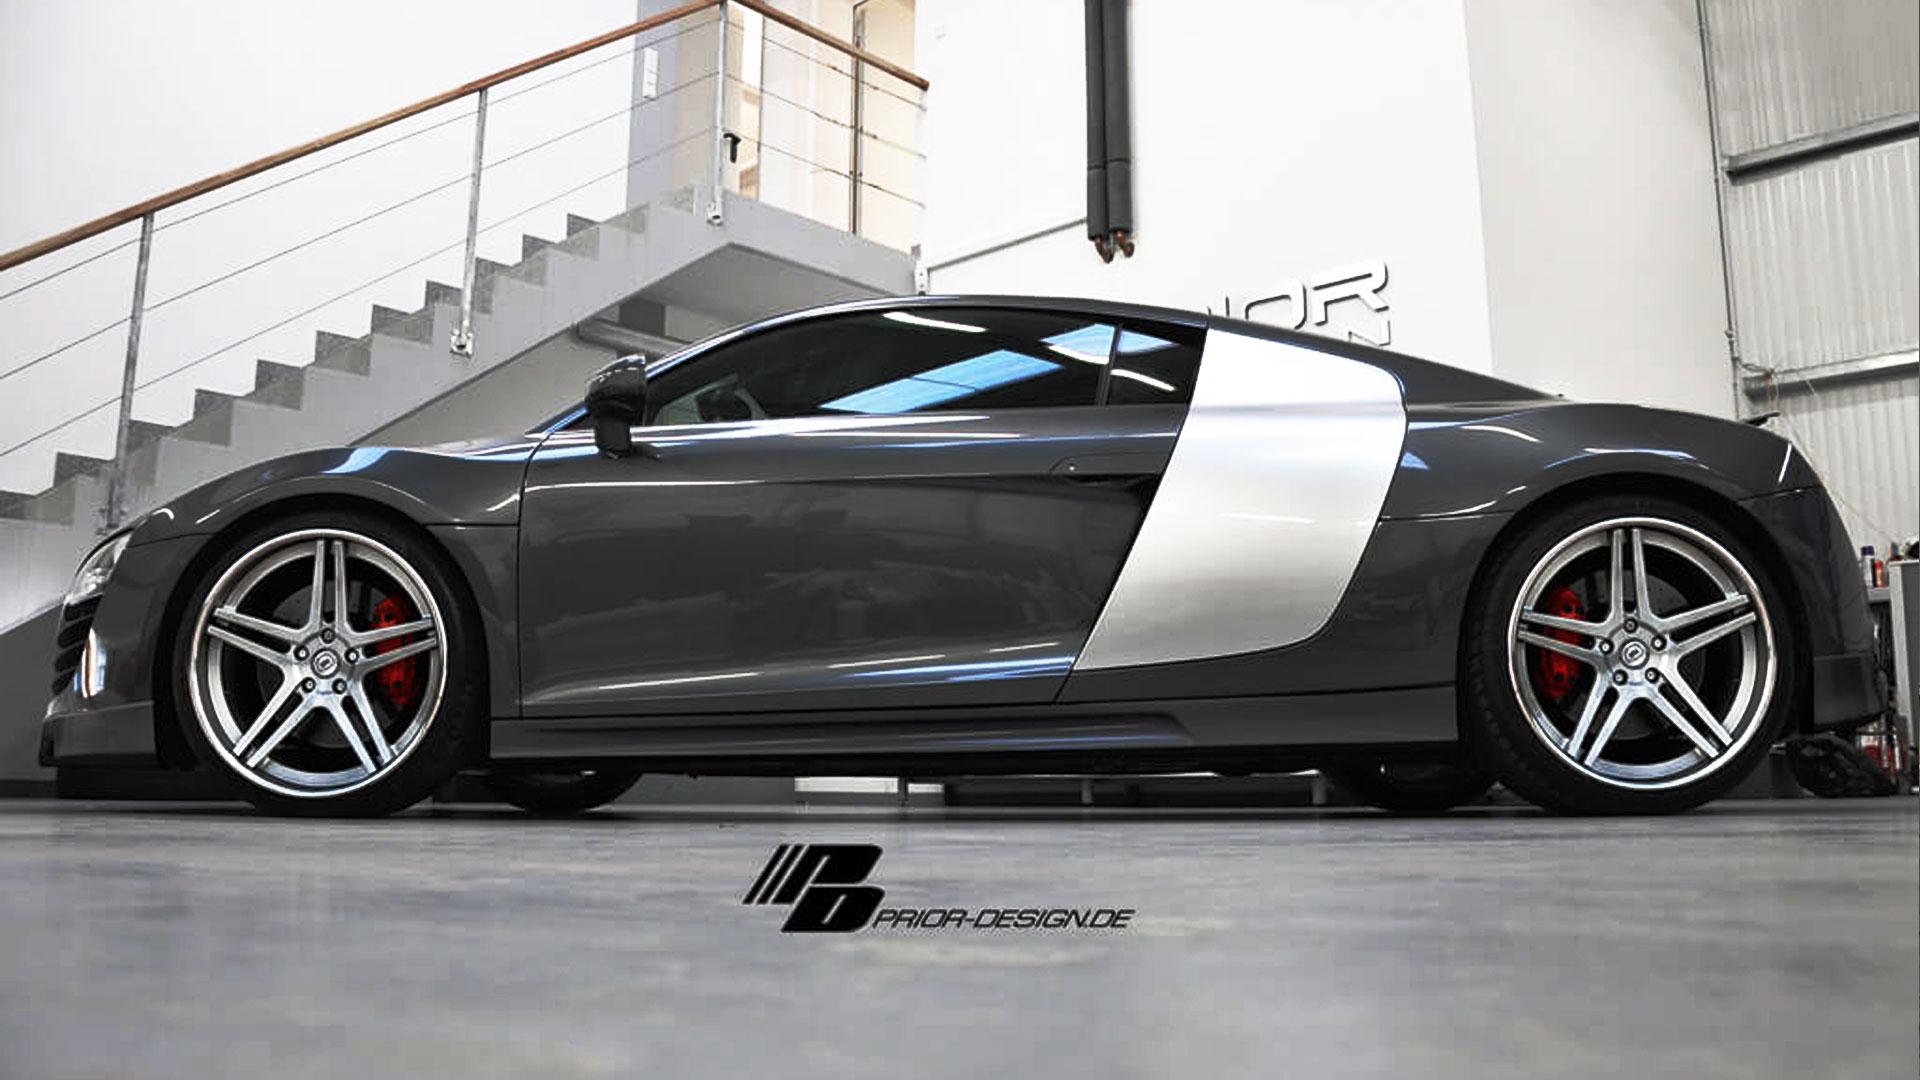 Kelebihan Kekurangan Audi R8 V8 Murah Berkualitas